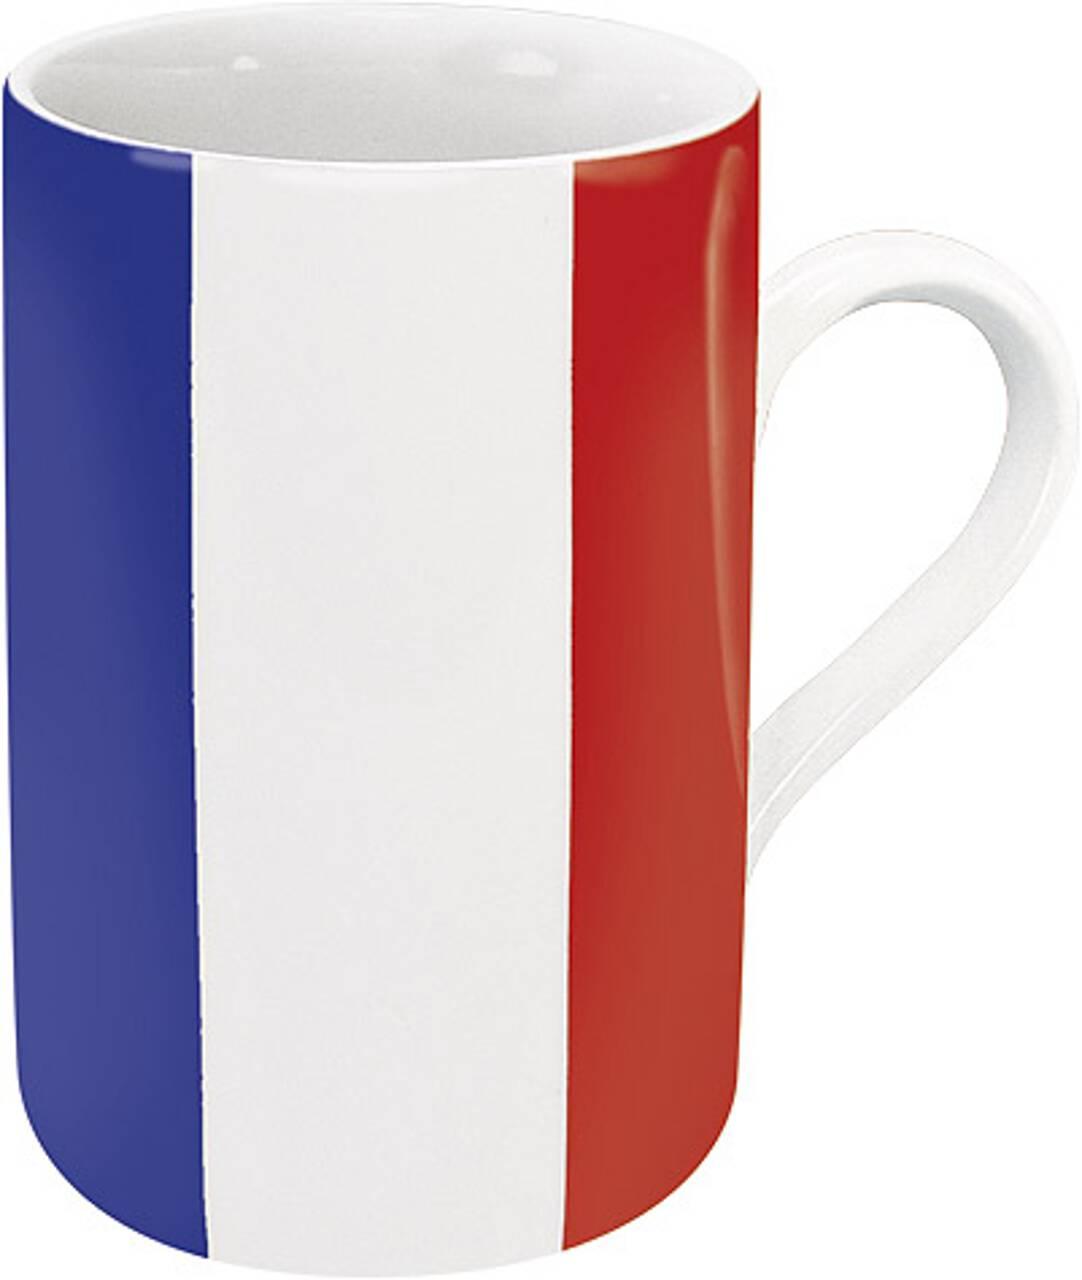 Kaffeebecher mit Motiv Frankreichflagge